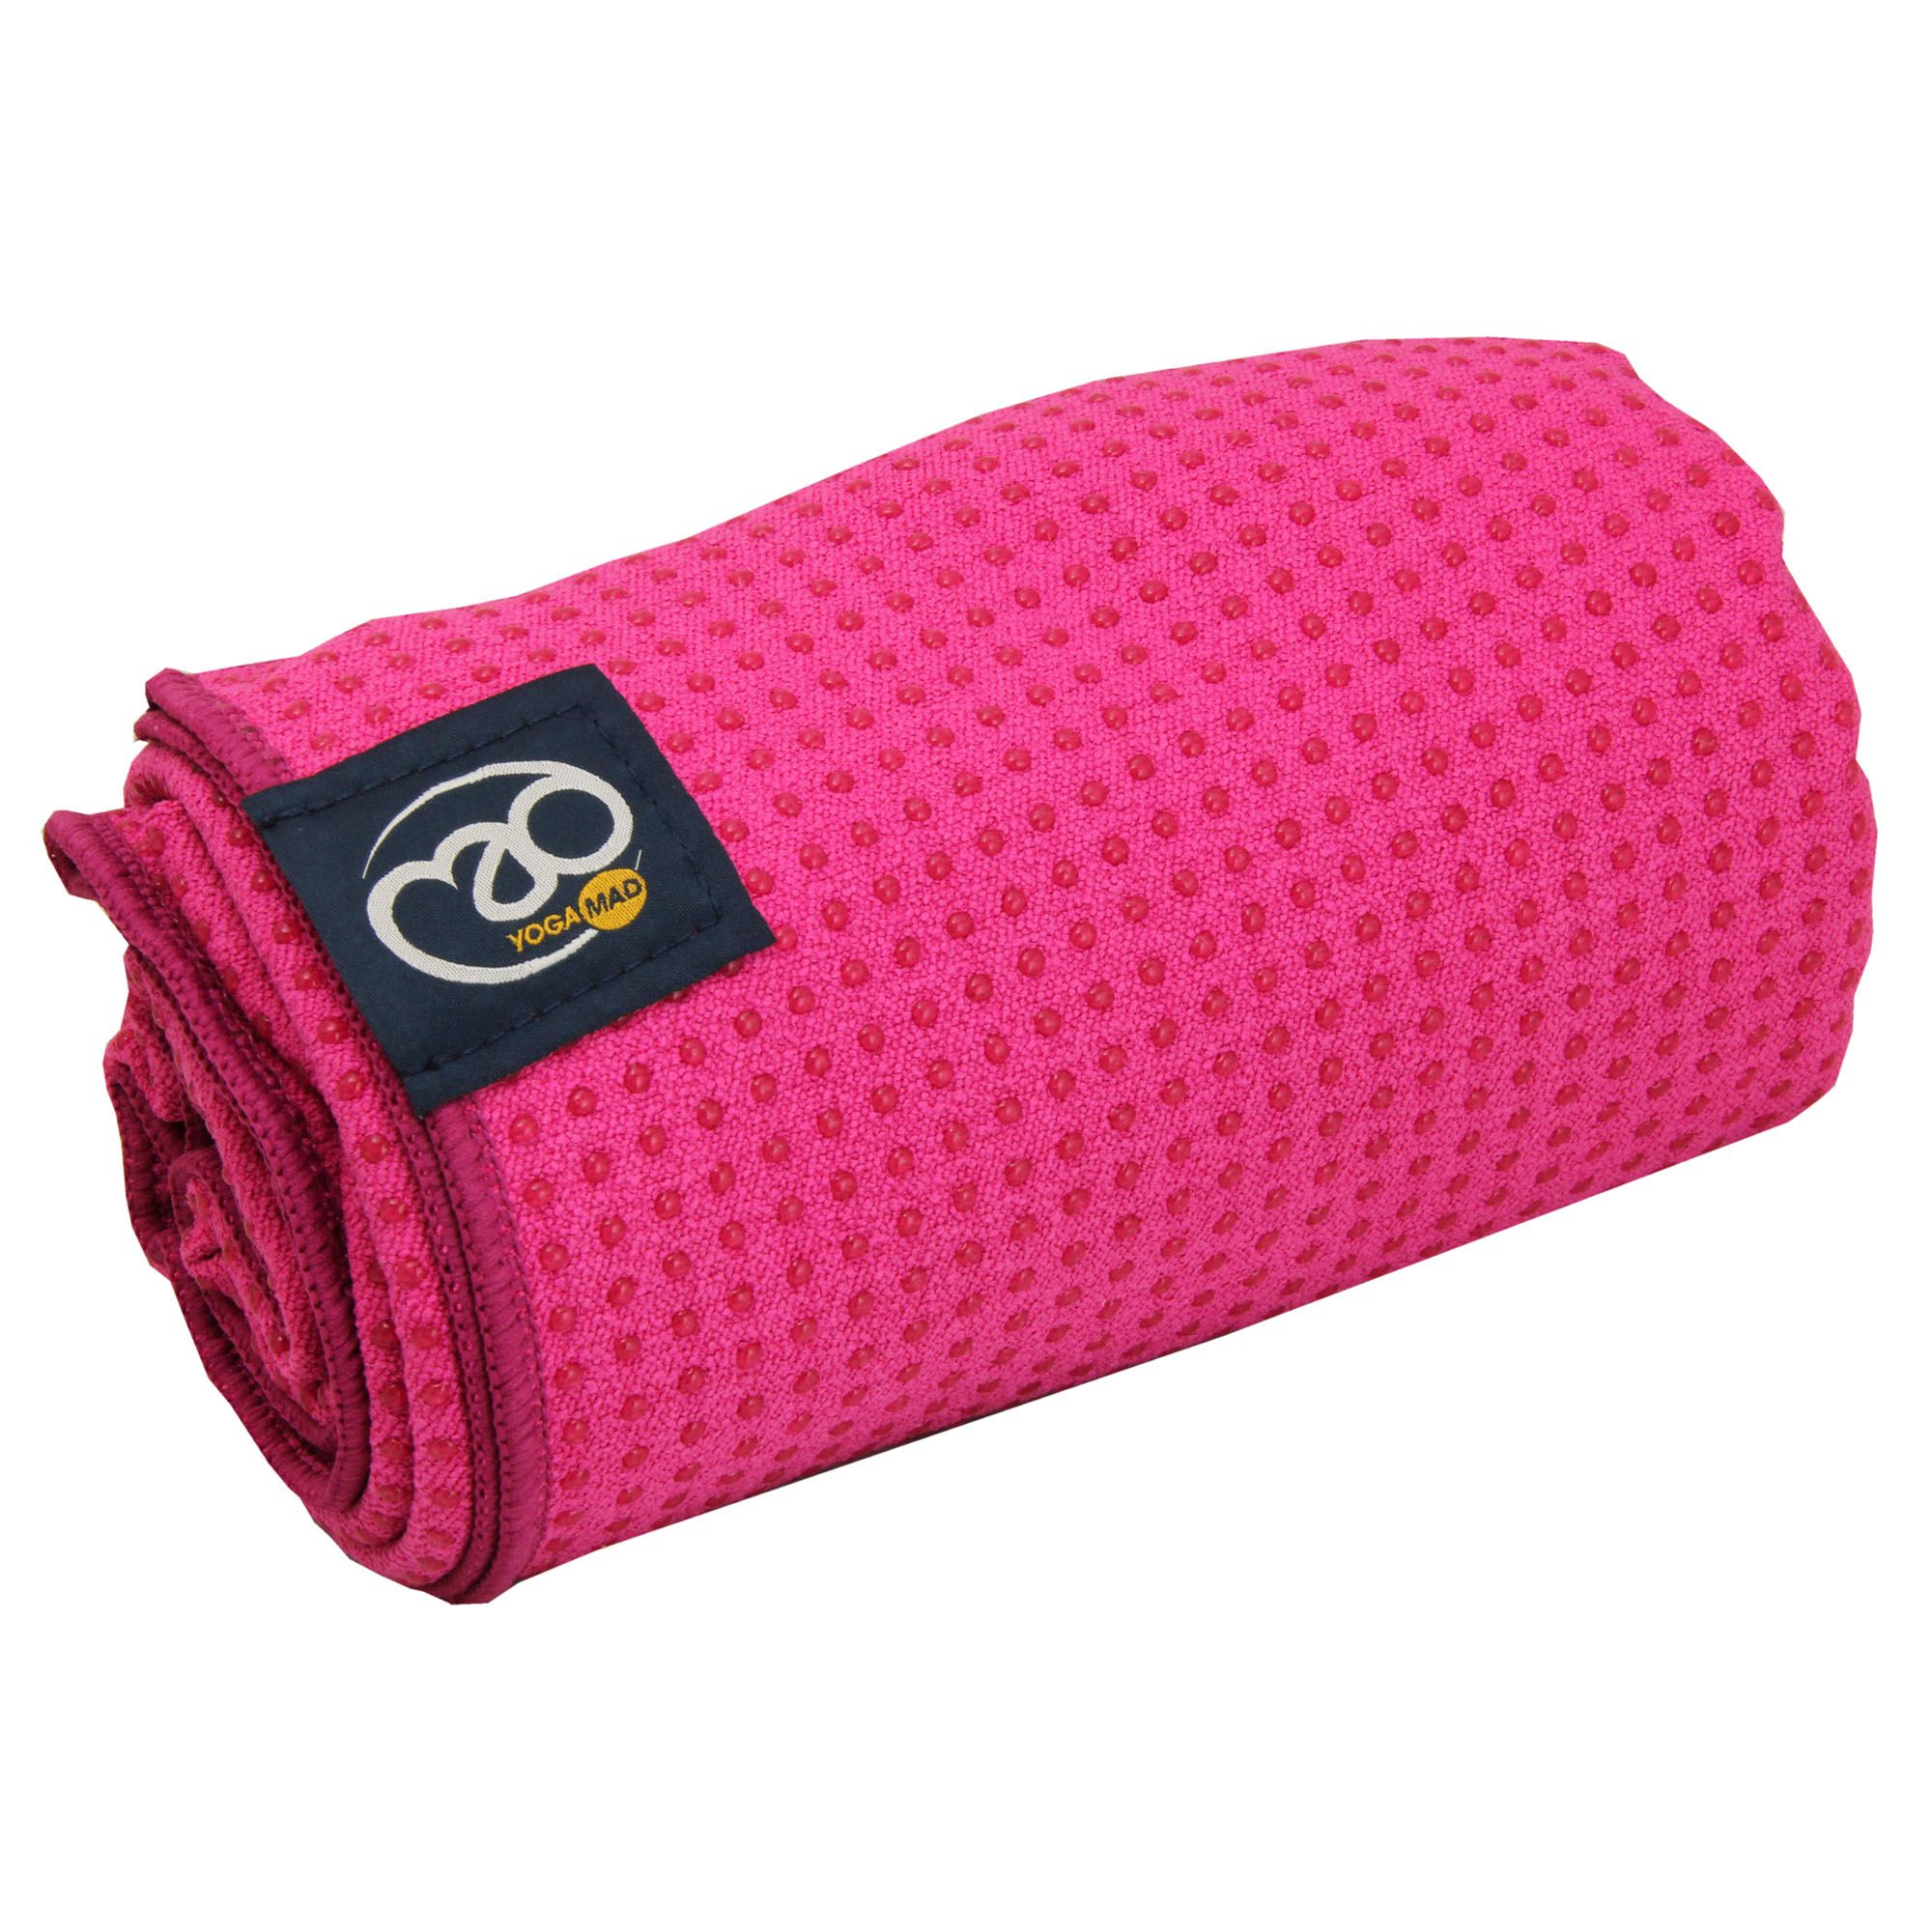 Yoga Mad Grip Dot Yoga Mat Towel